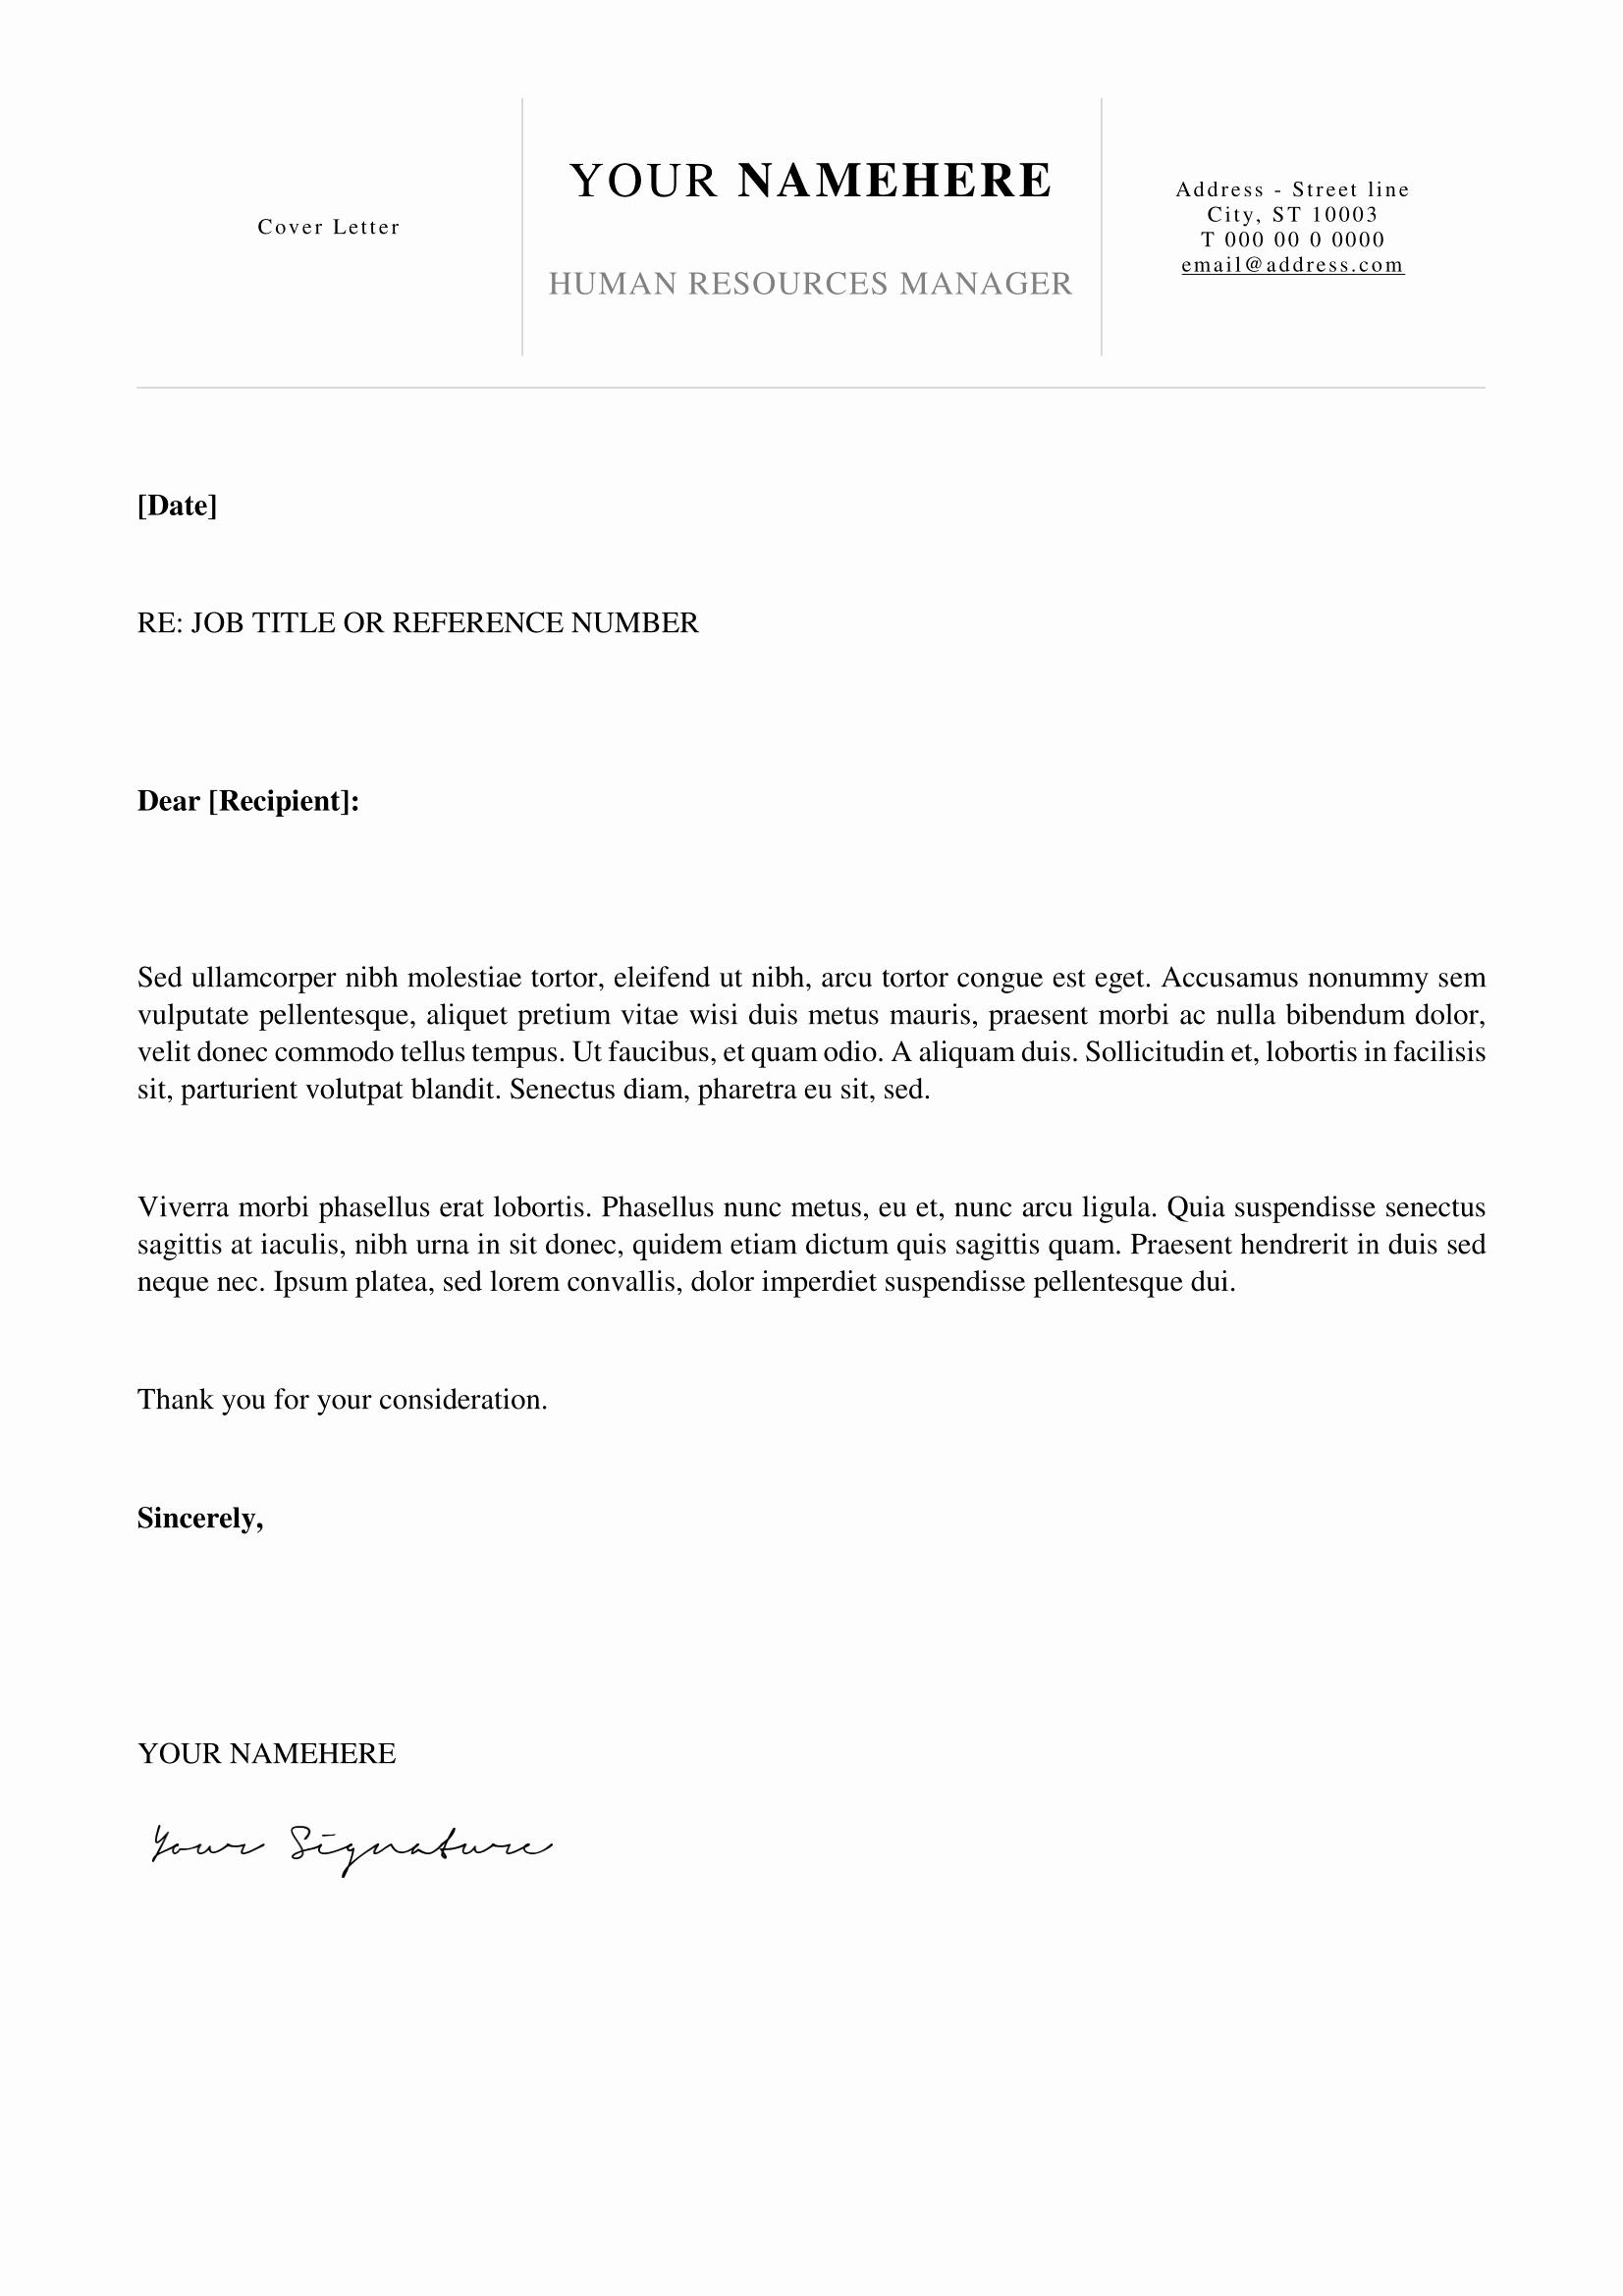 Simple Cover Letter format Elegant Kallio Free Simple Cover Letter Template for Word Docx